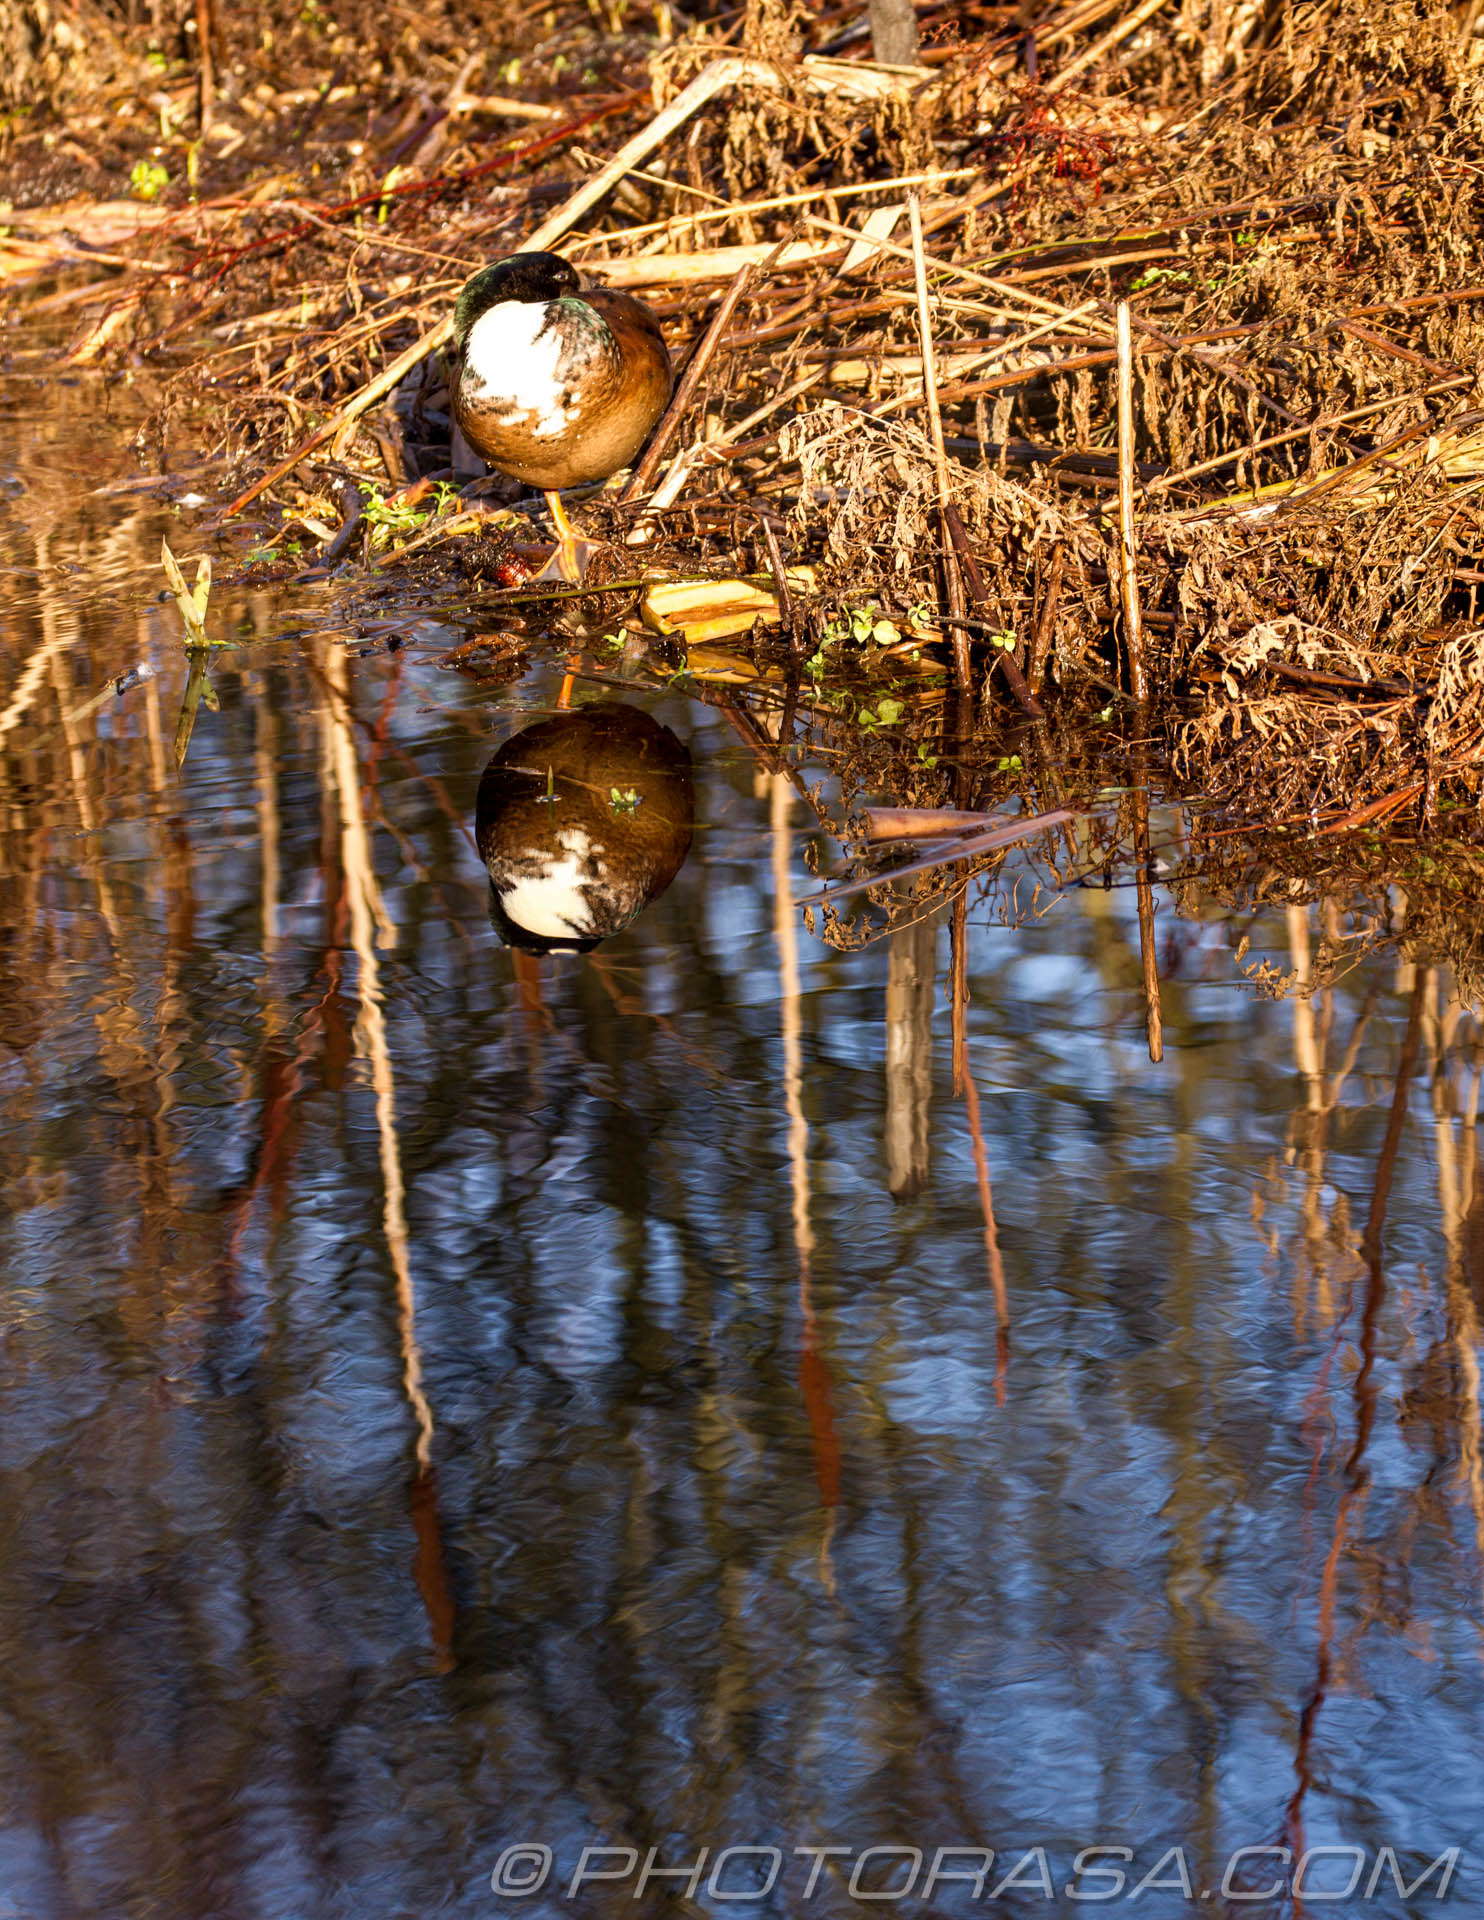 http://photorasa.com/ducks-bullrushes/white-breasted-drake-and-bullrushes-reflected-in-river/